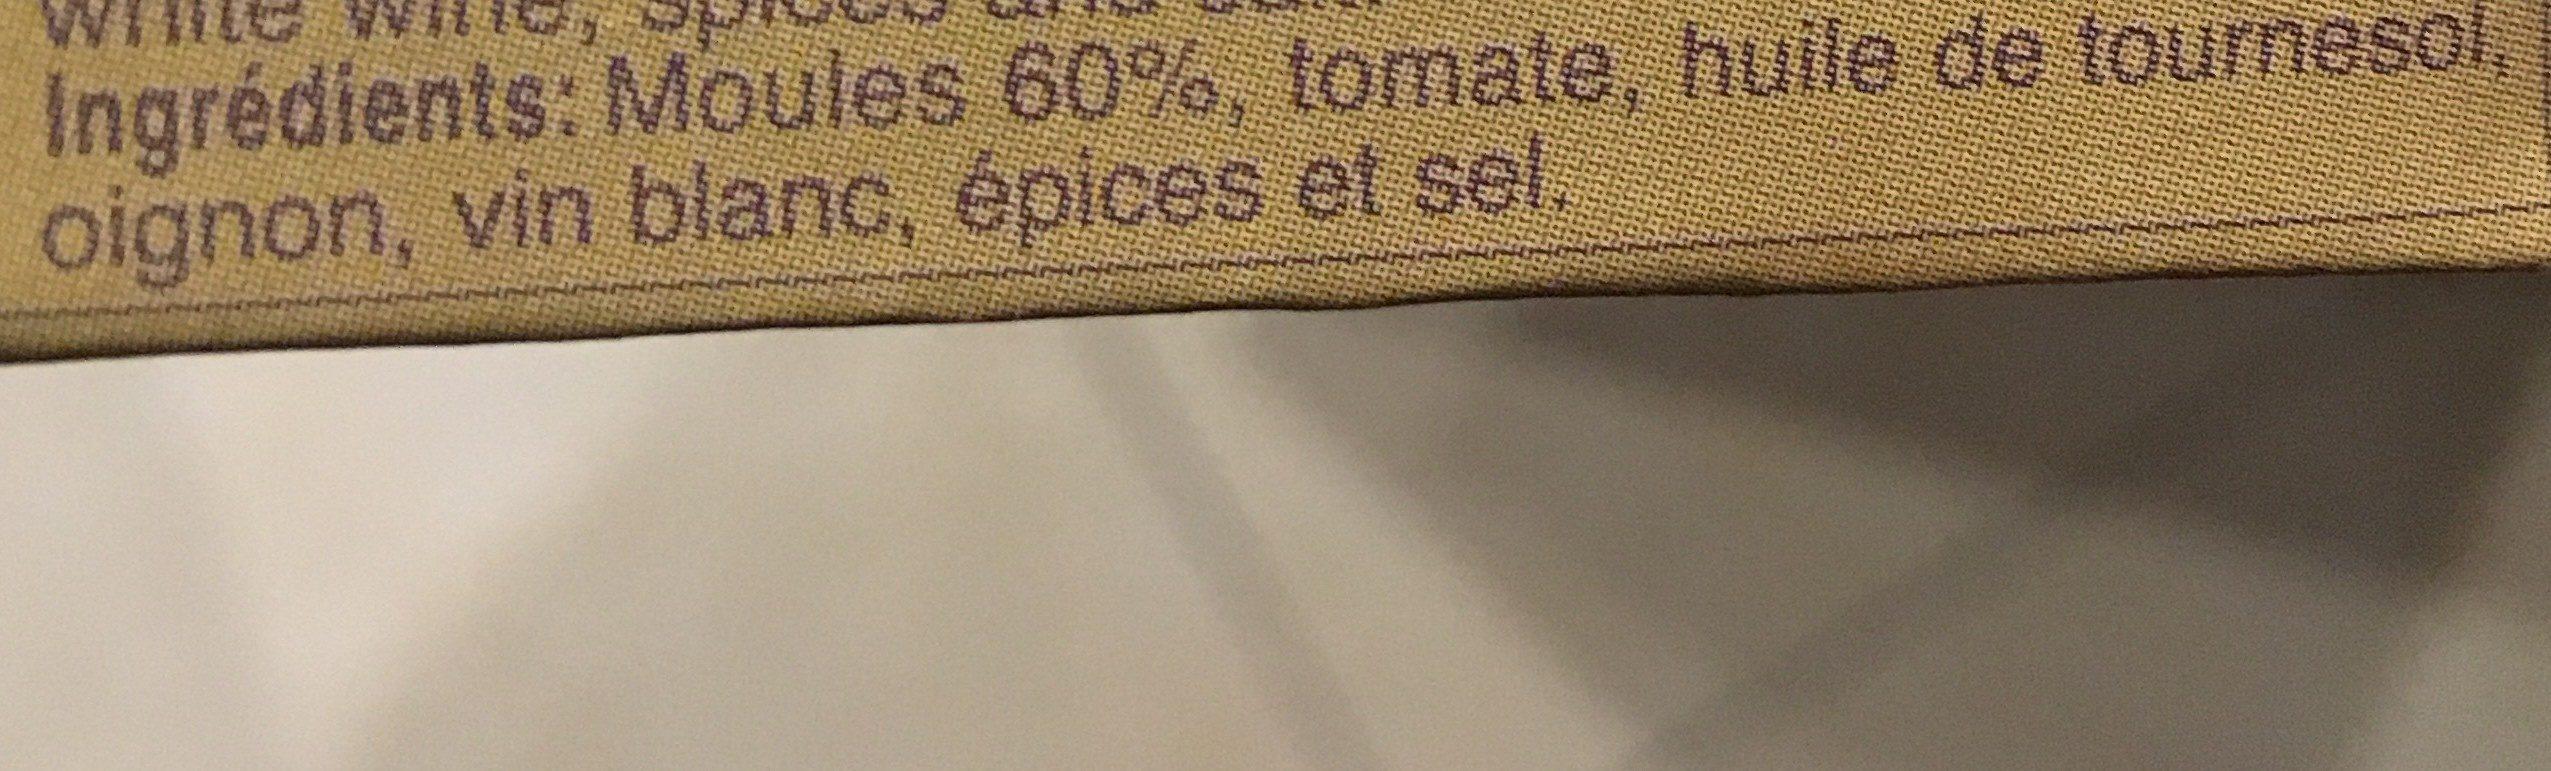 Mejillones - Ingrédients - fr